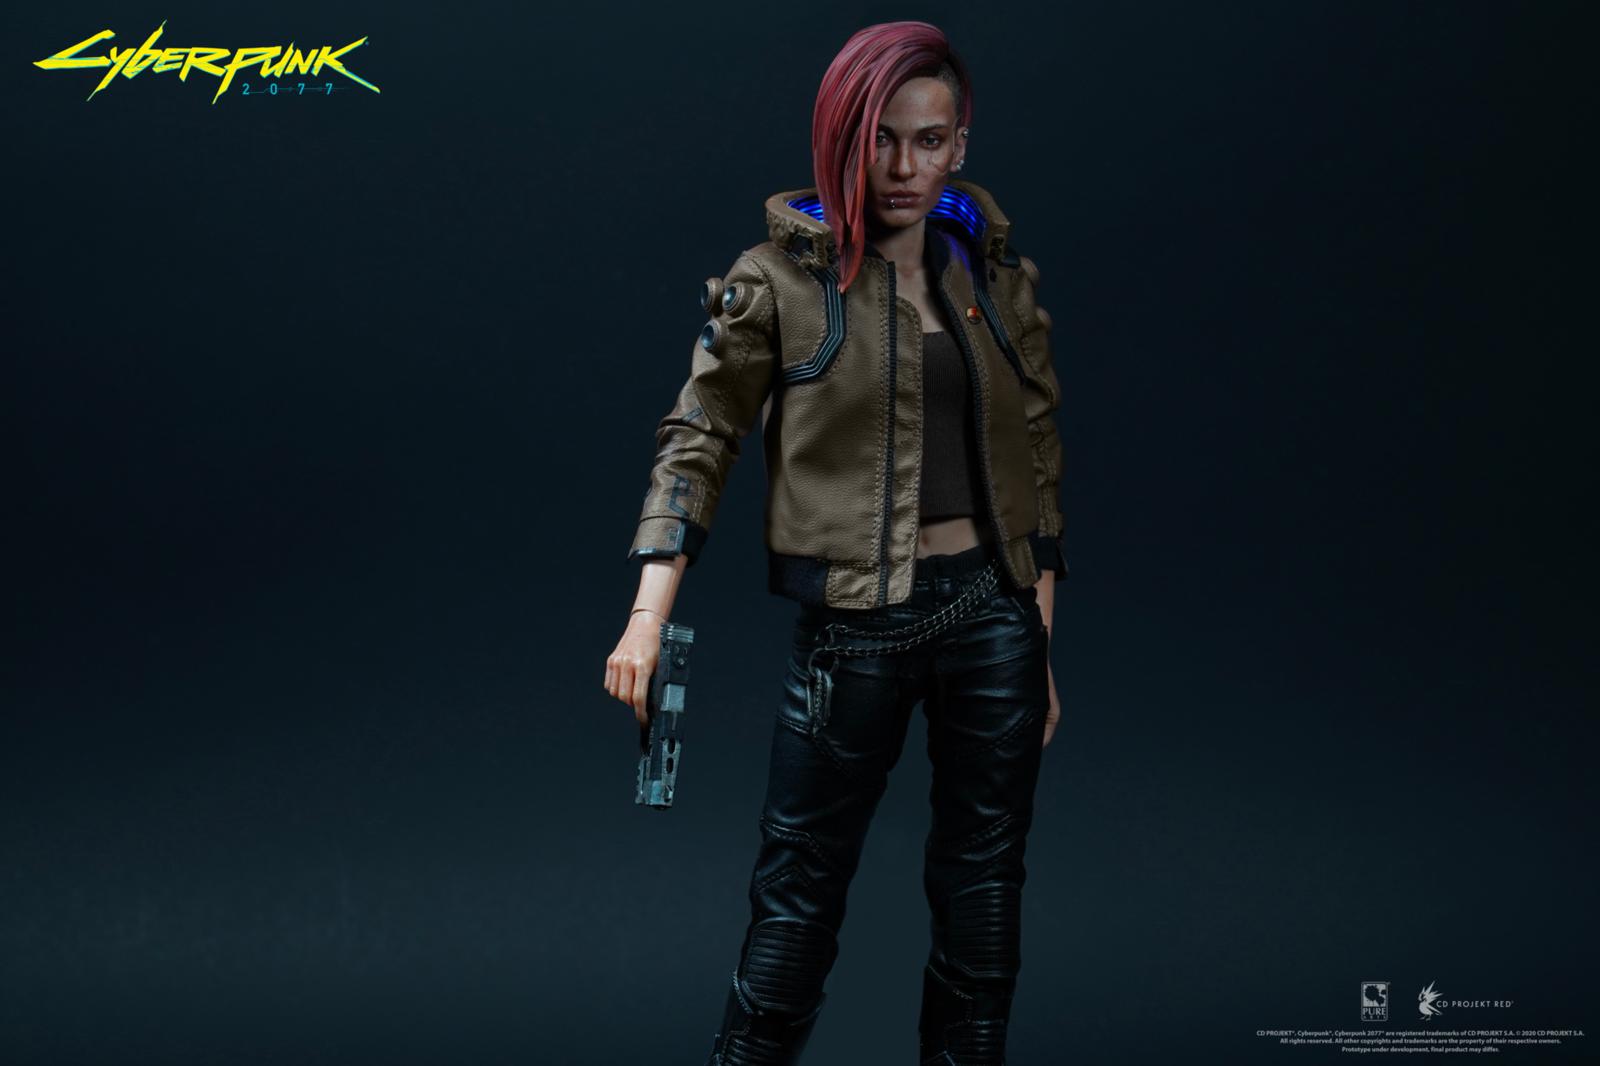 Cyberpunk 2077: V-Female & Yaiba Kusanagi - 1:6 Scale Articulated Figure Set image